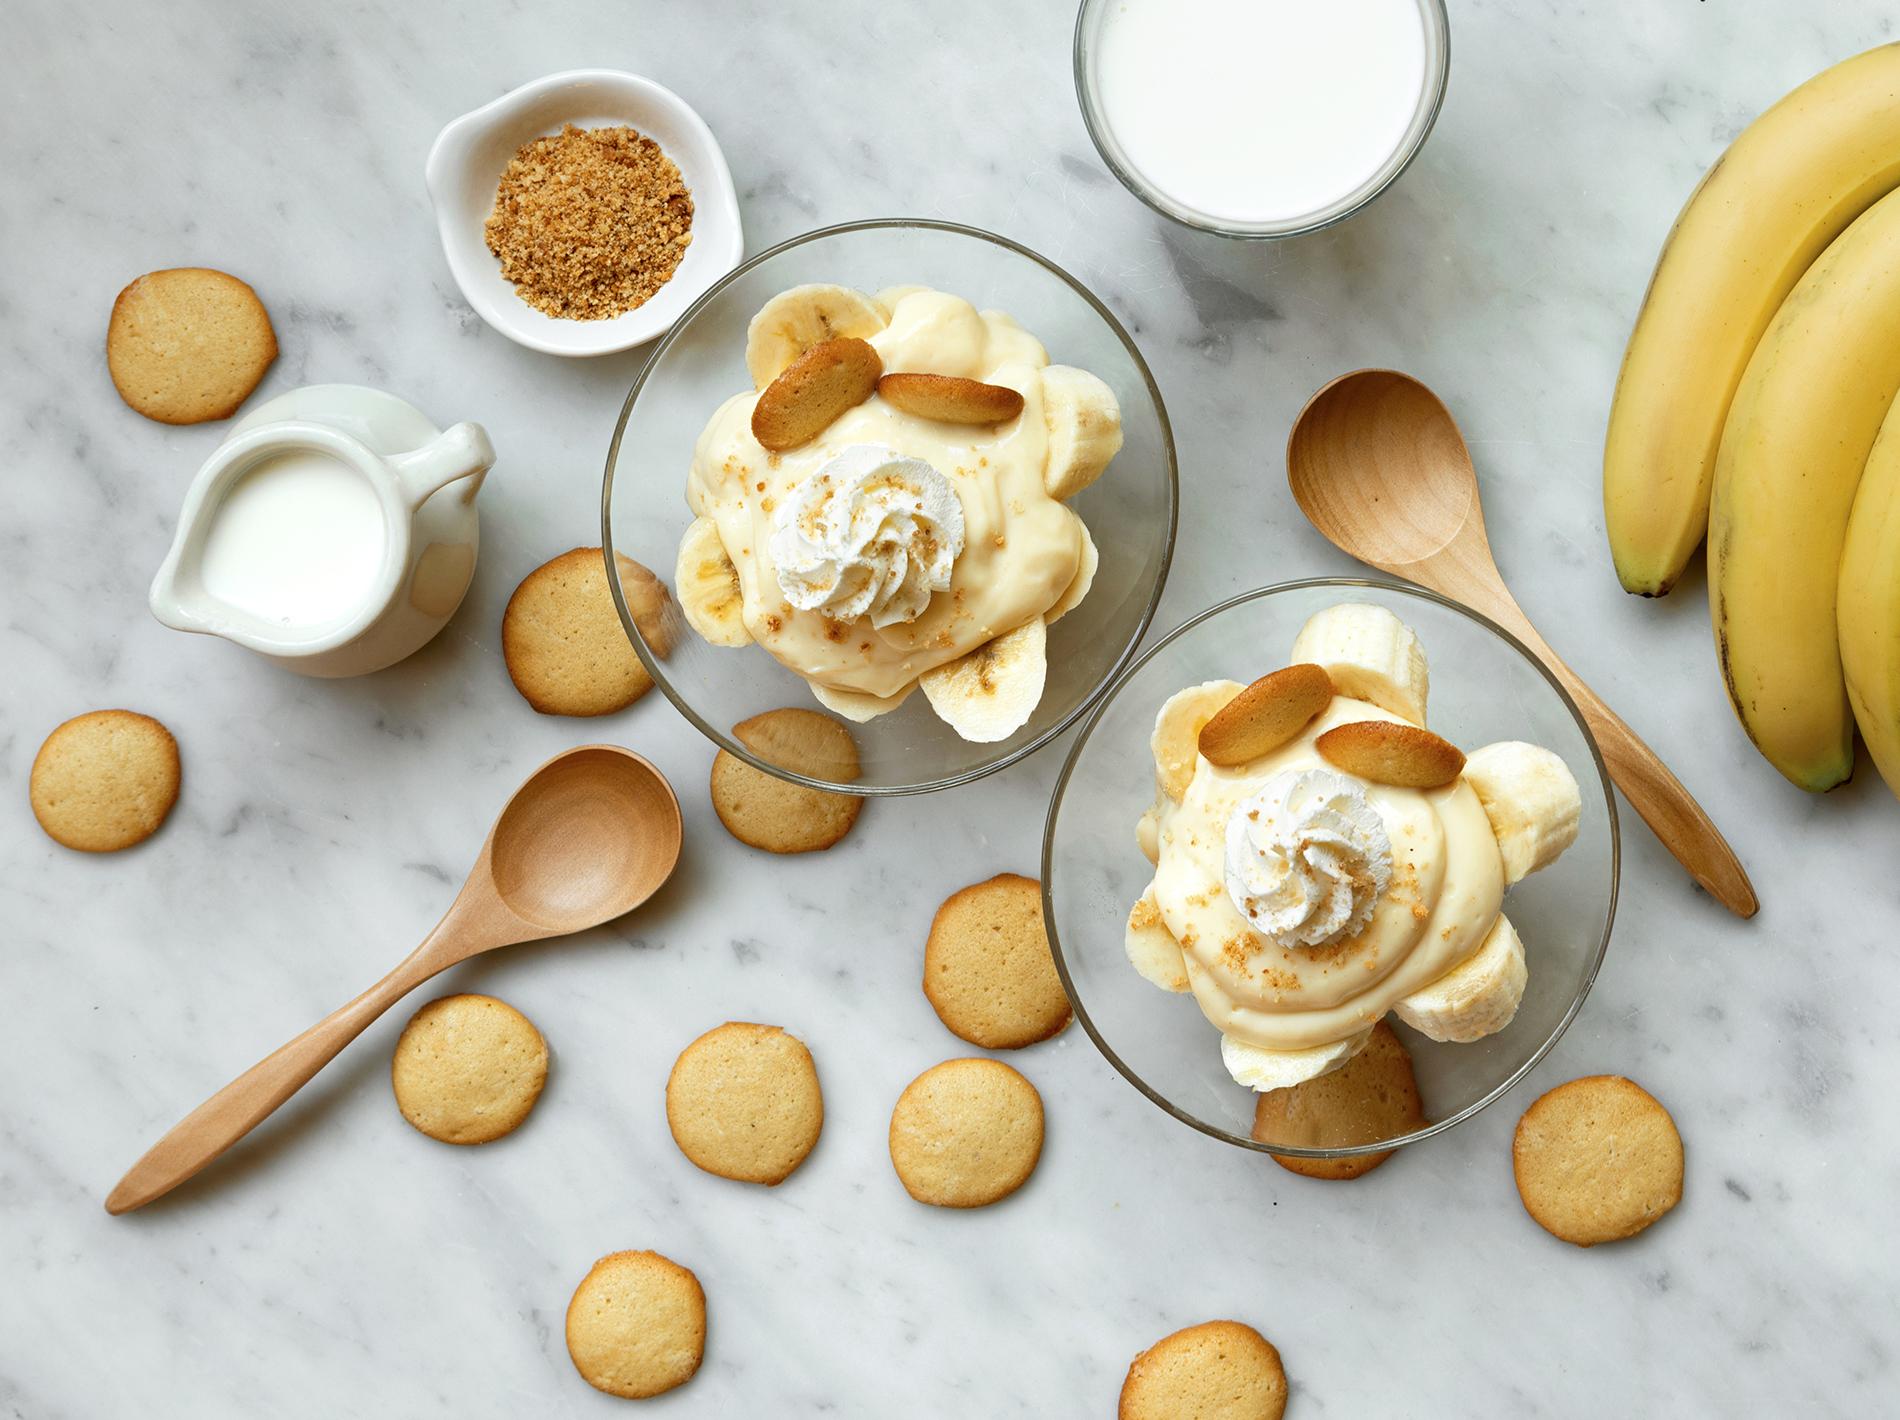 Banana Pudding with Homemade Vanilla Wafers